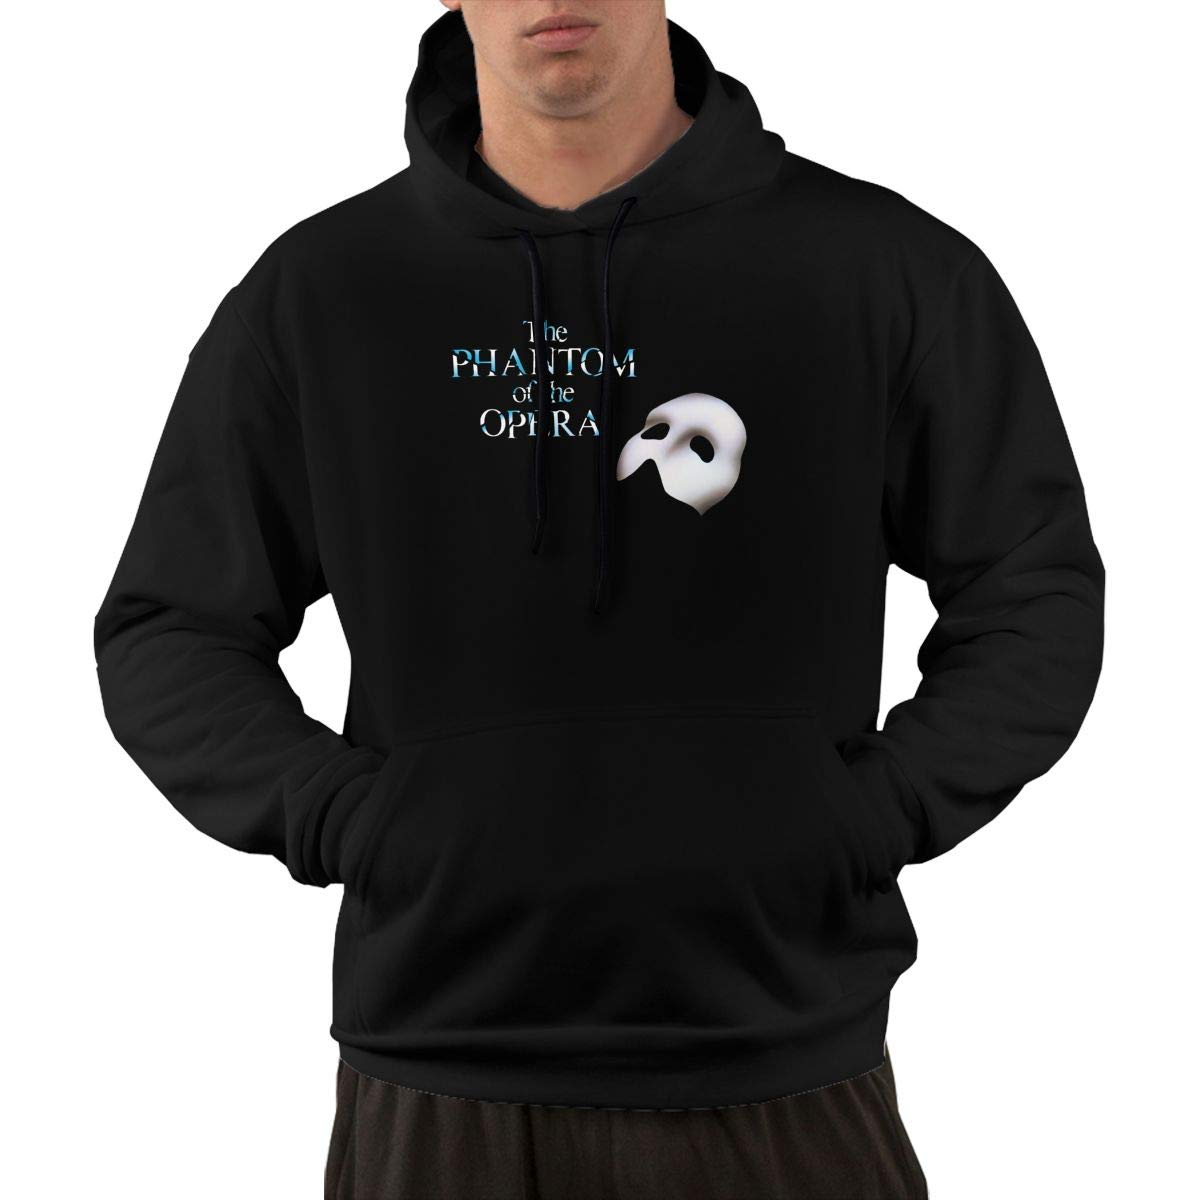 S S The Phantom Of The Opera Hooded Shirts